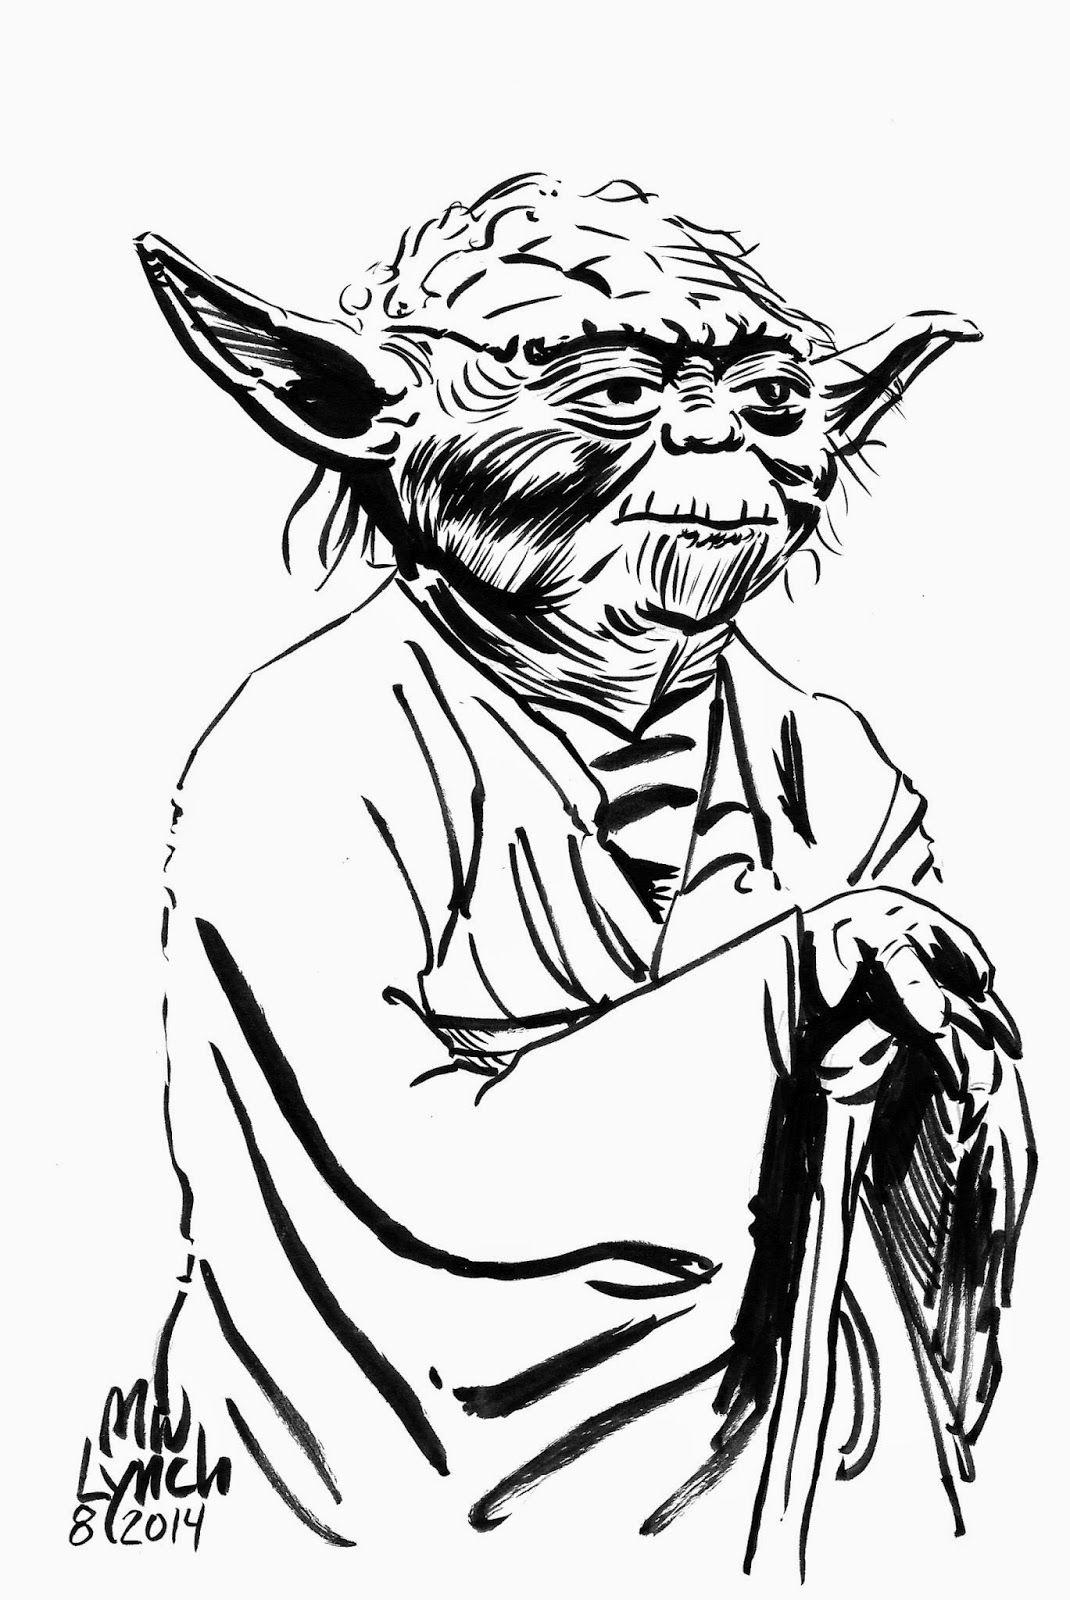 Yoda Star Wars Brush And Ink Illustration